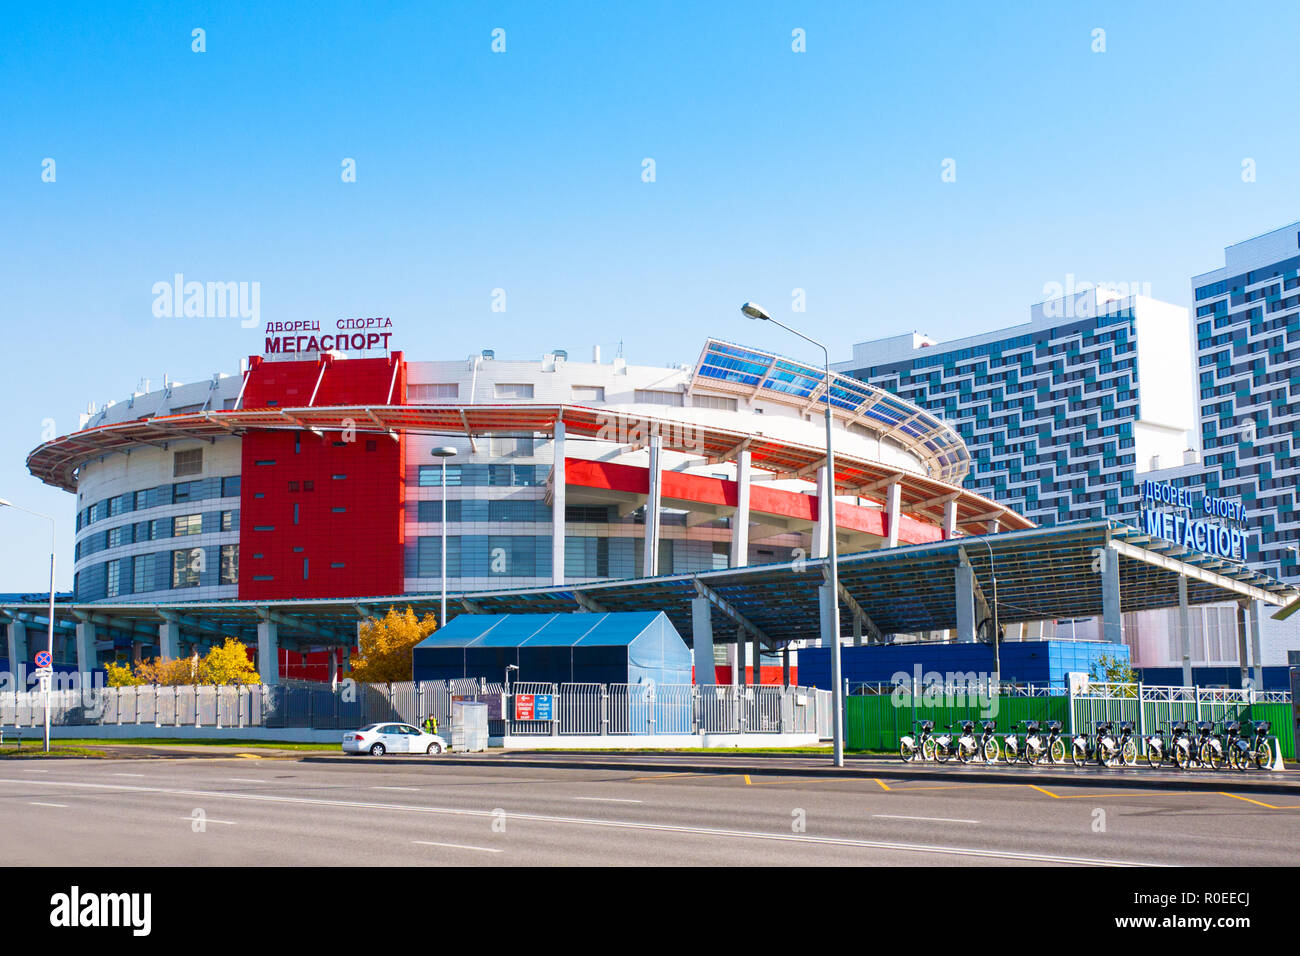 Palace of Sports Megasport on Khodynka